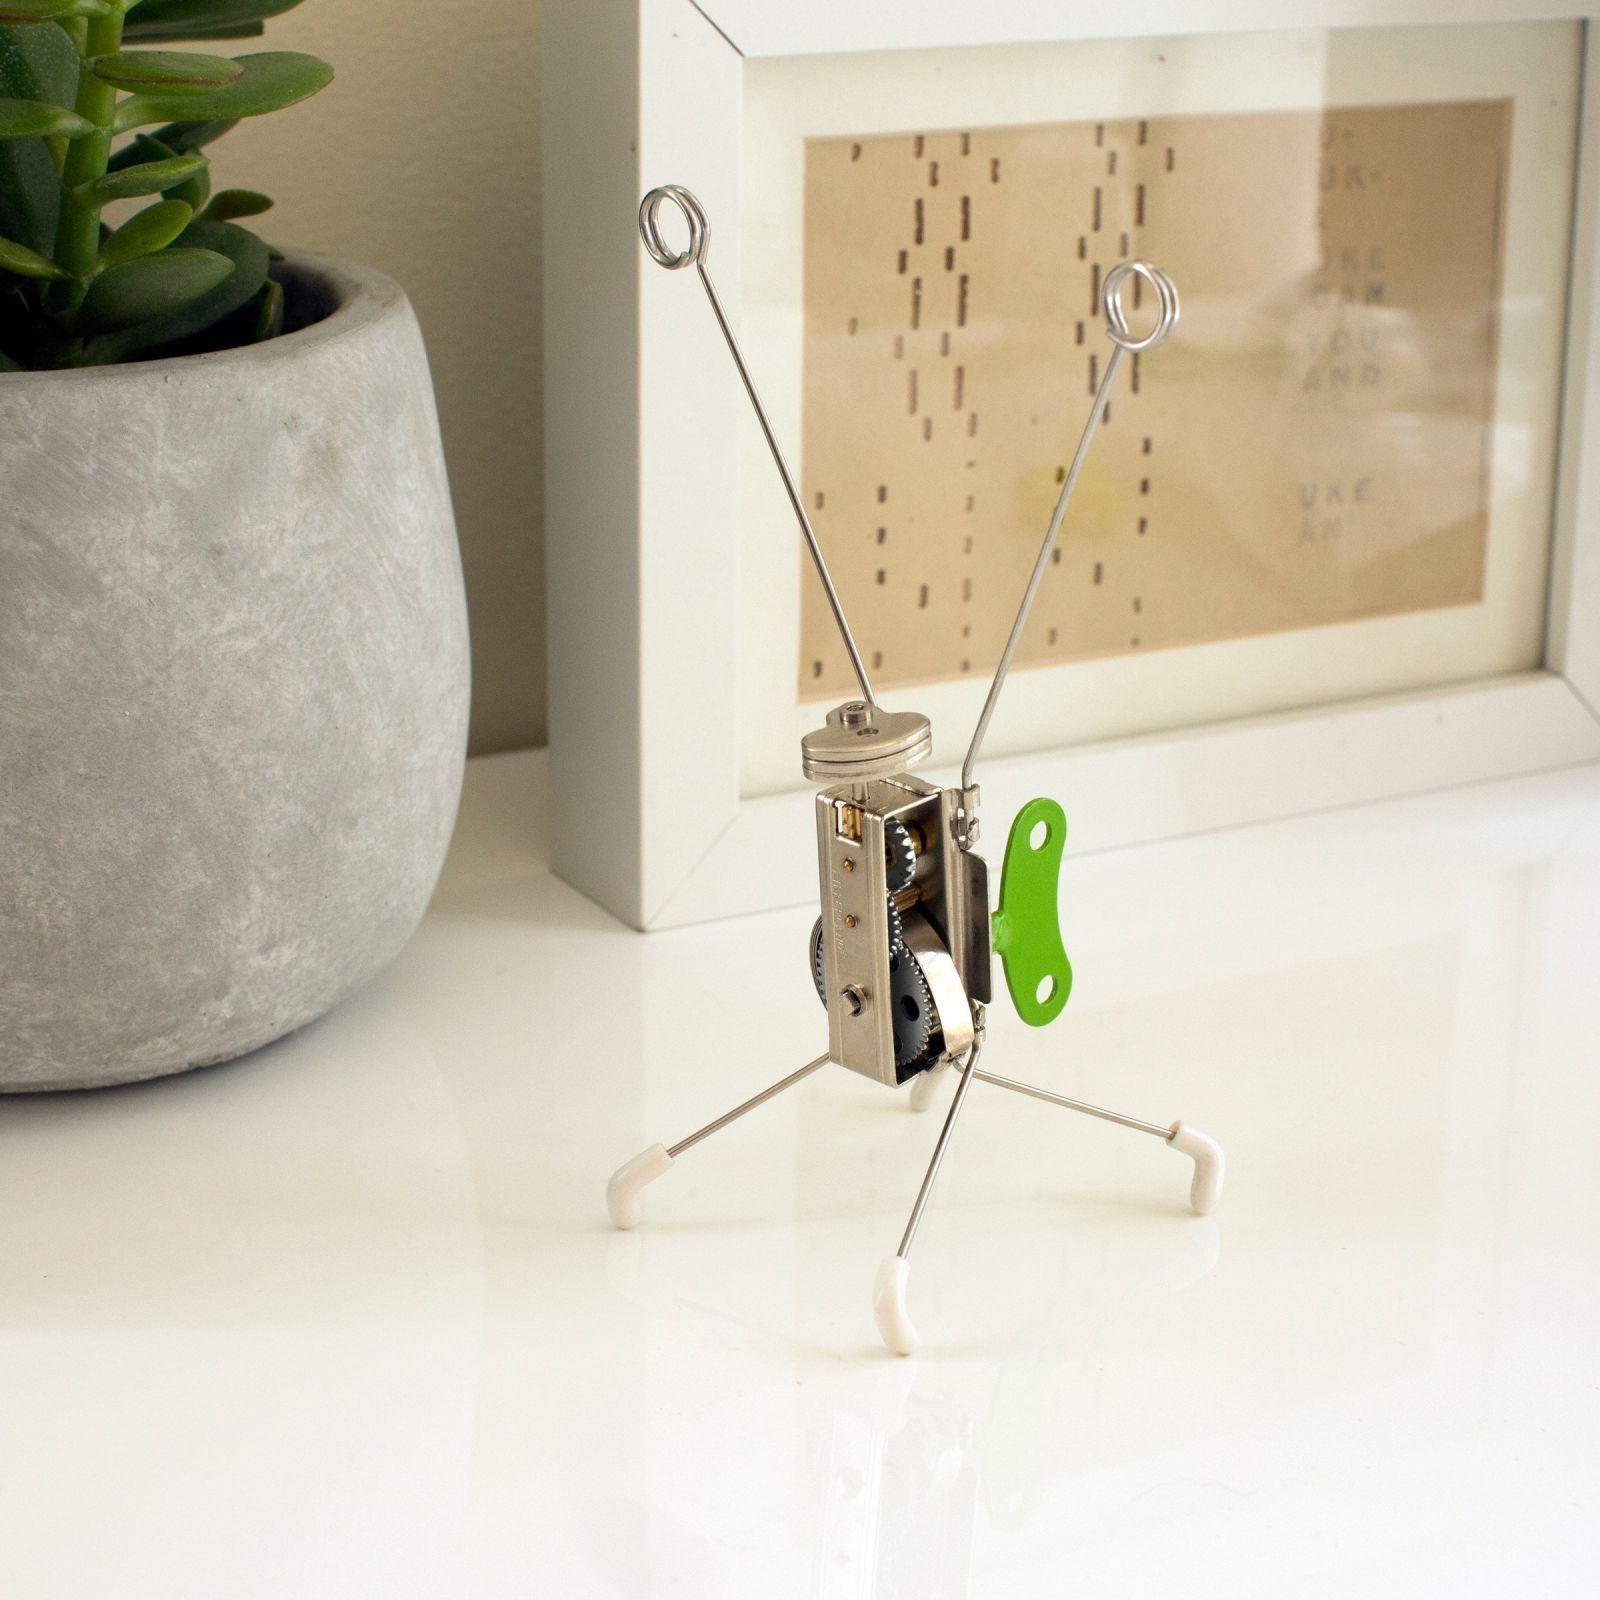 robot cranky kikkerland